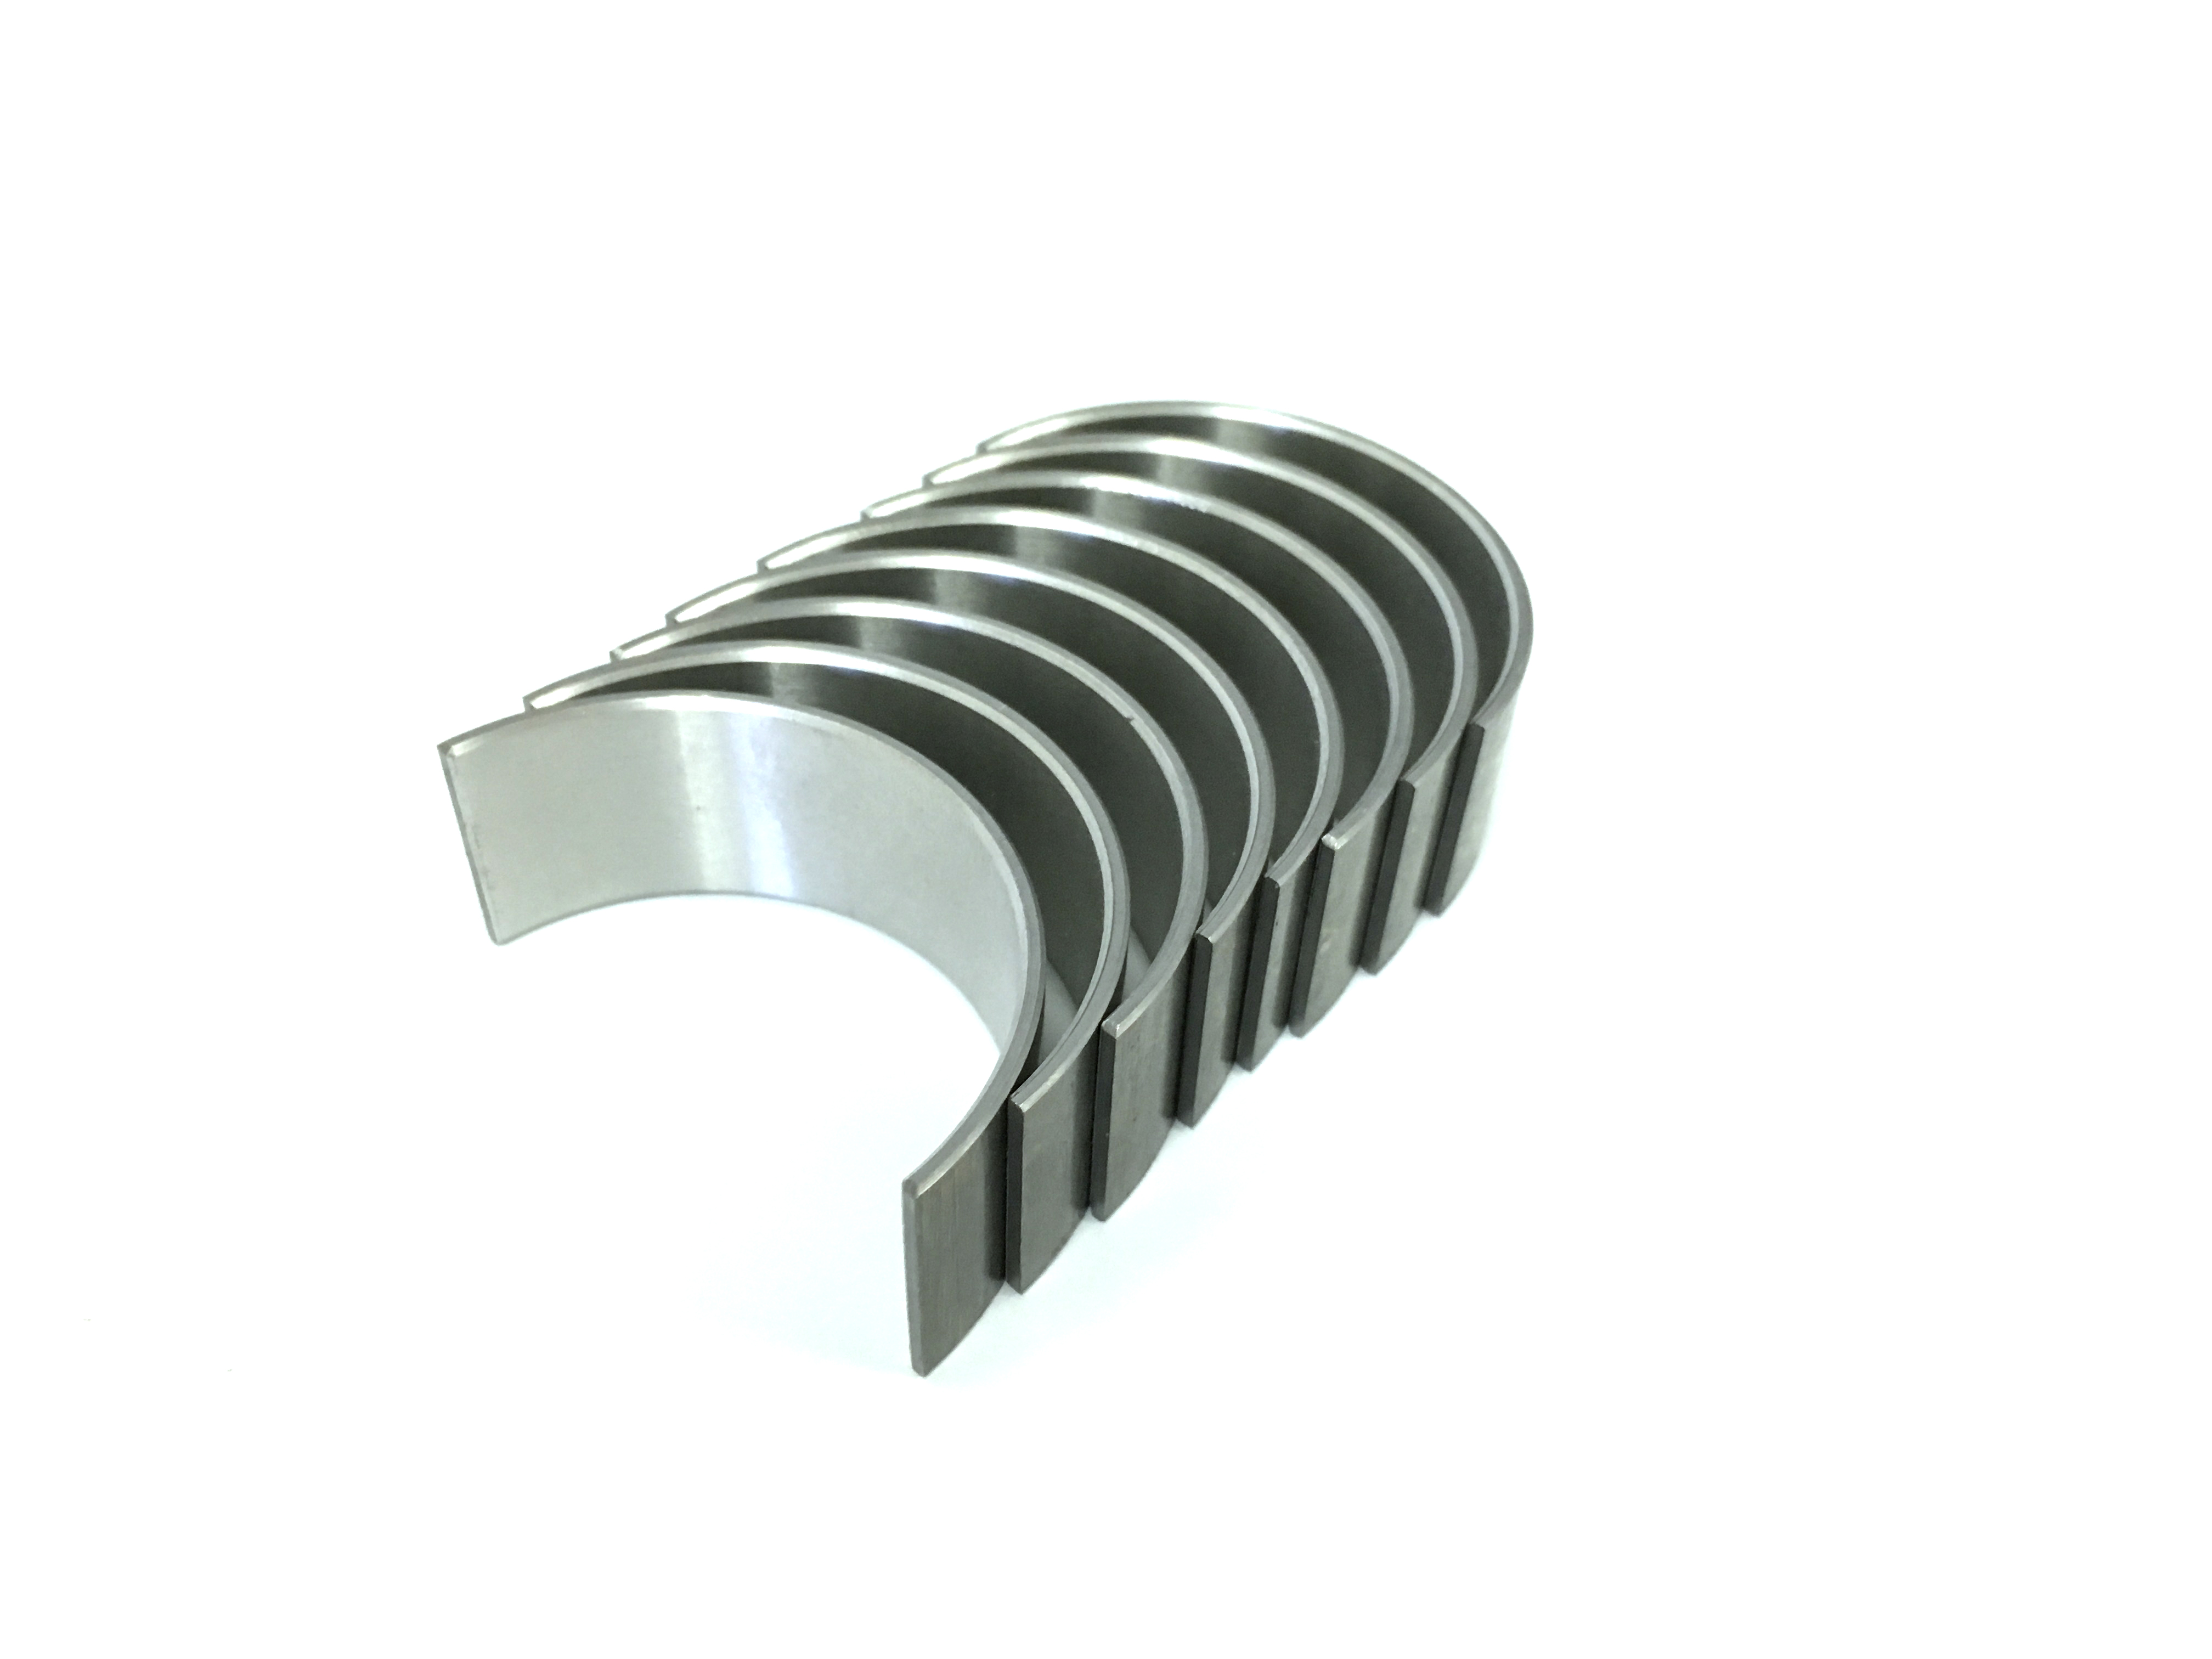 Pleuellagerschale Pleuellager Mini Citroen 1,6 5FR EP6DT 11247586035 NEU +0,25